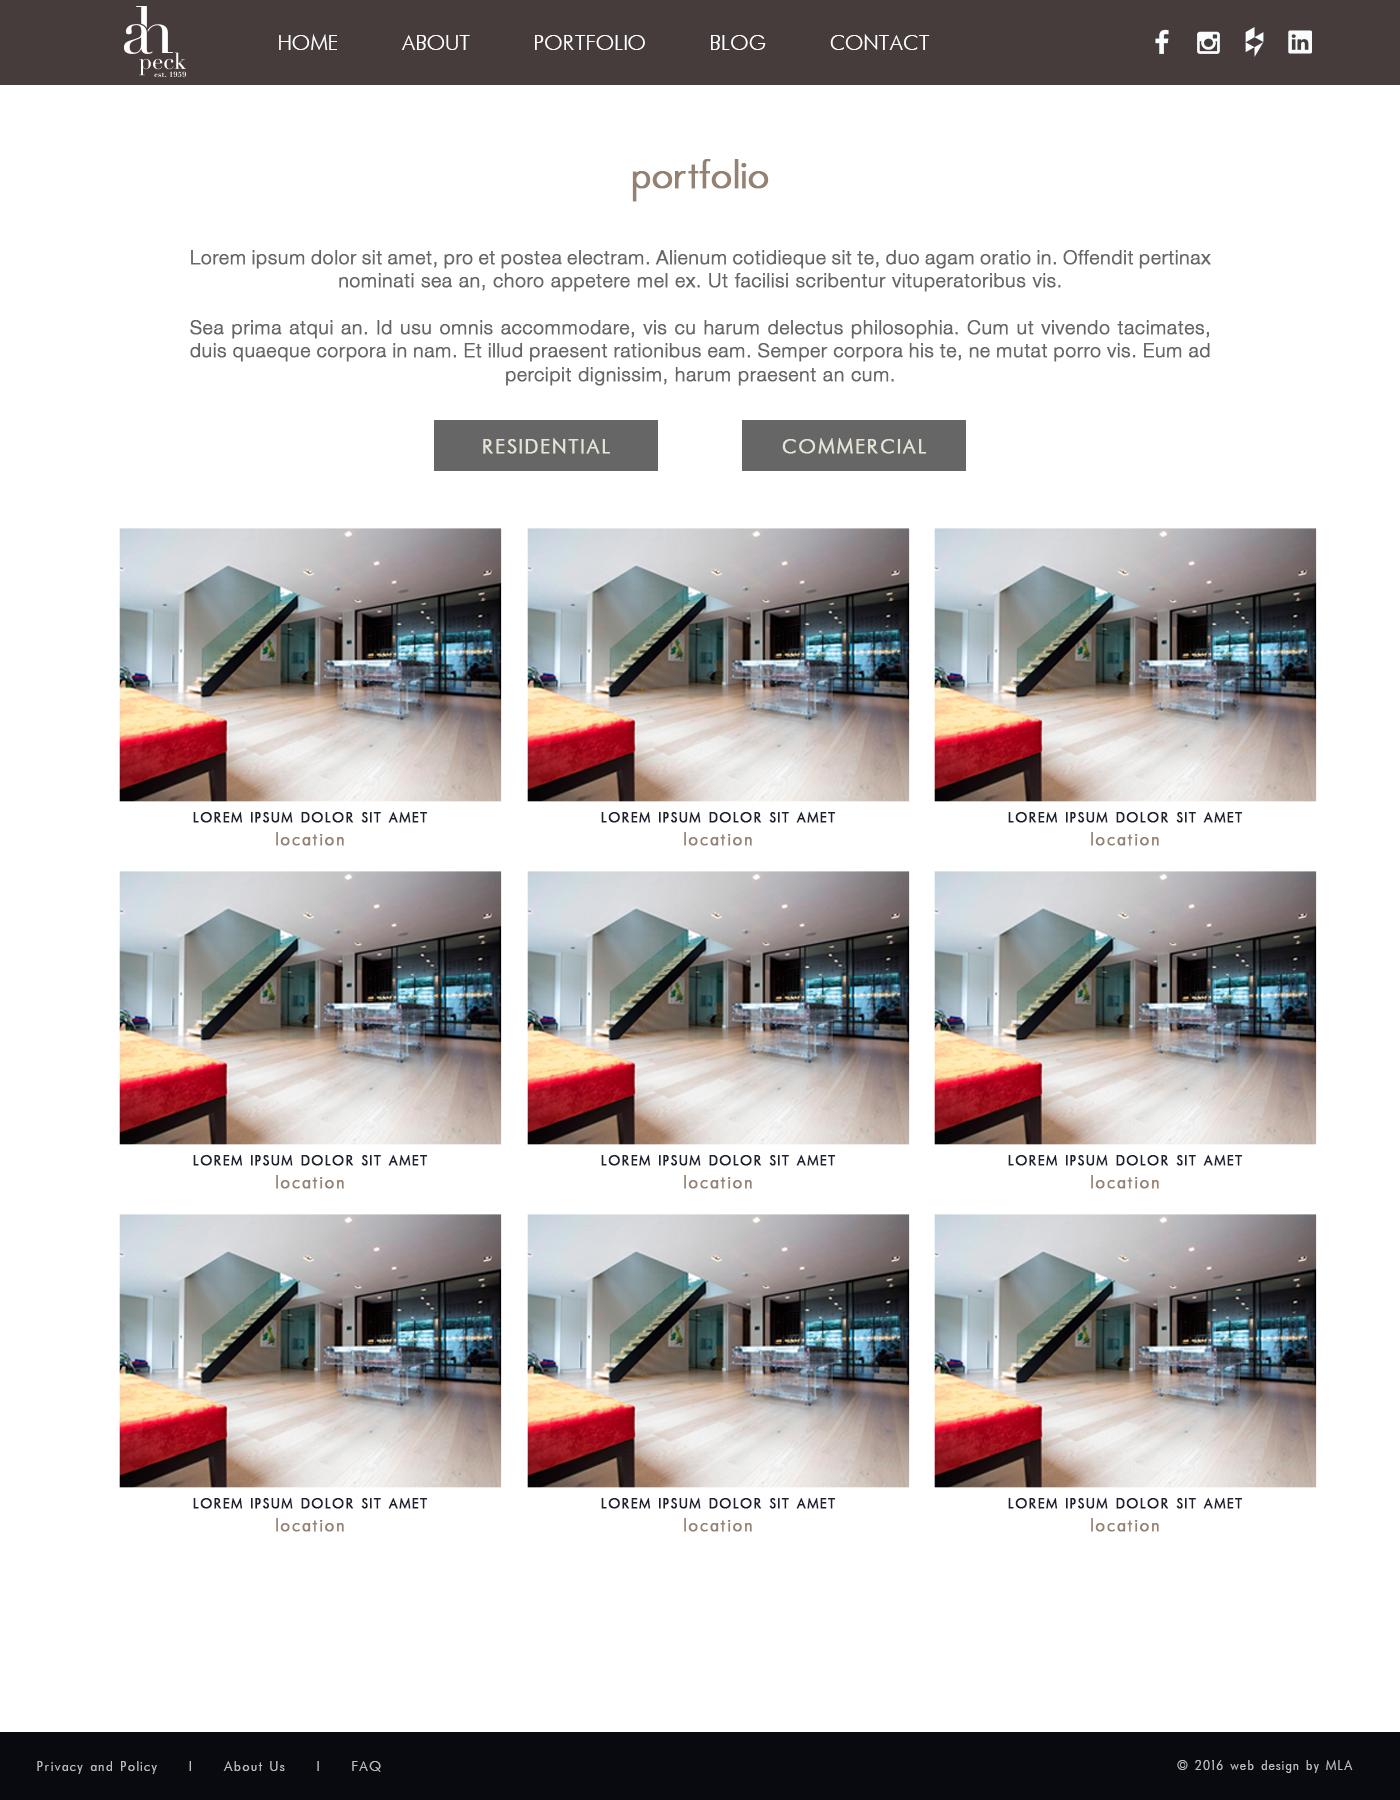 A.H Peck portfolio page design